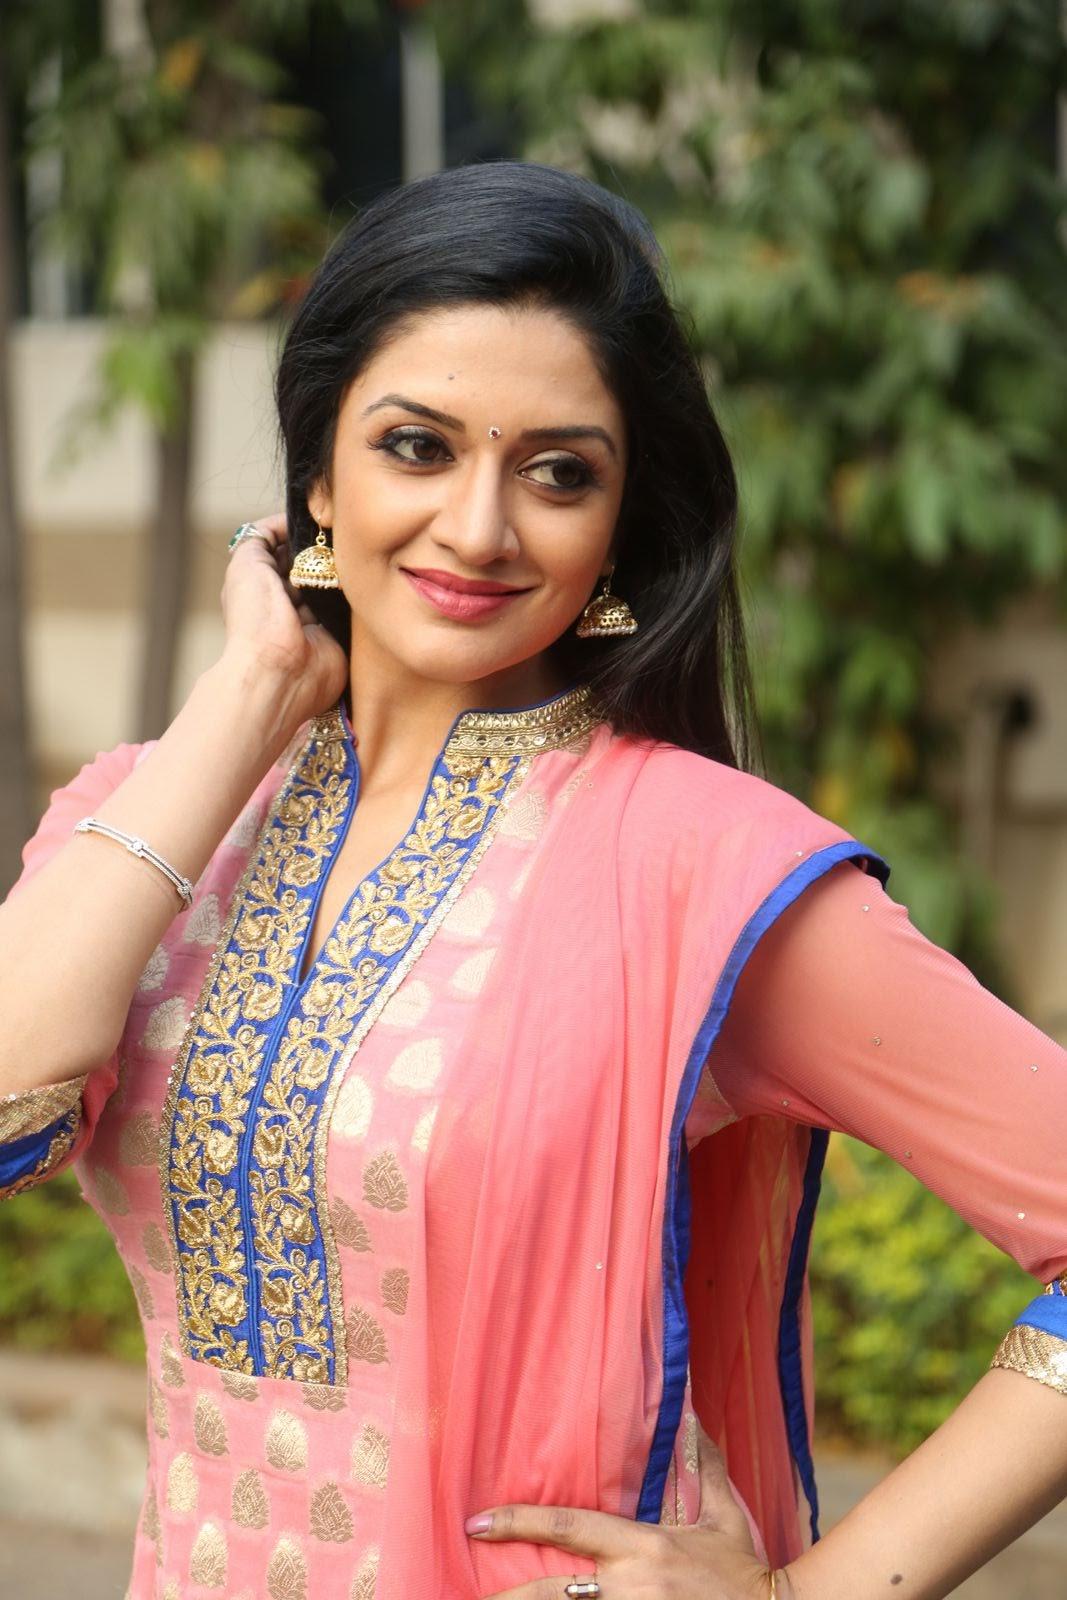 tags vimala new photos vimala vimala stills vimala photos vimala gallery vimala latest stills vimala new gallery vimala actress vimala heroine